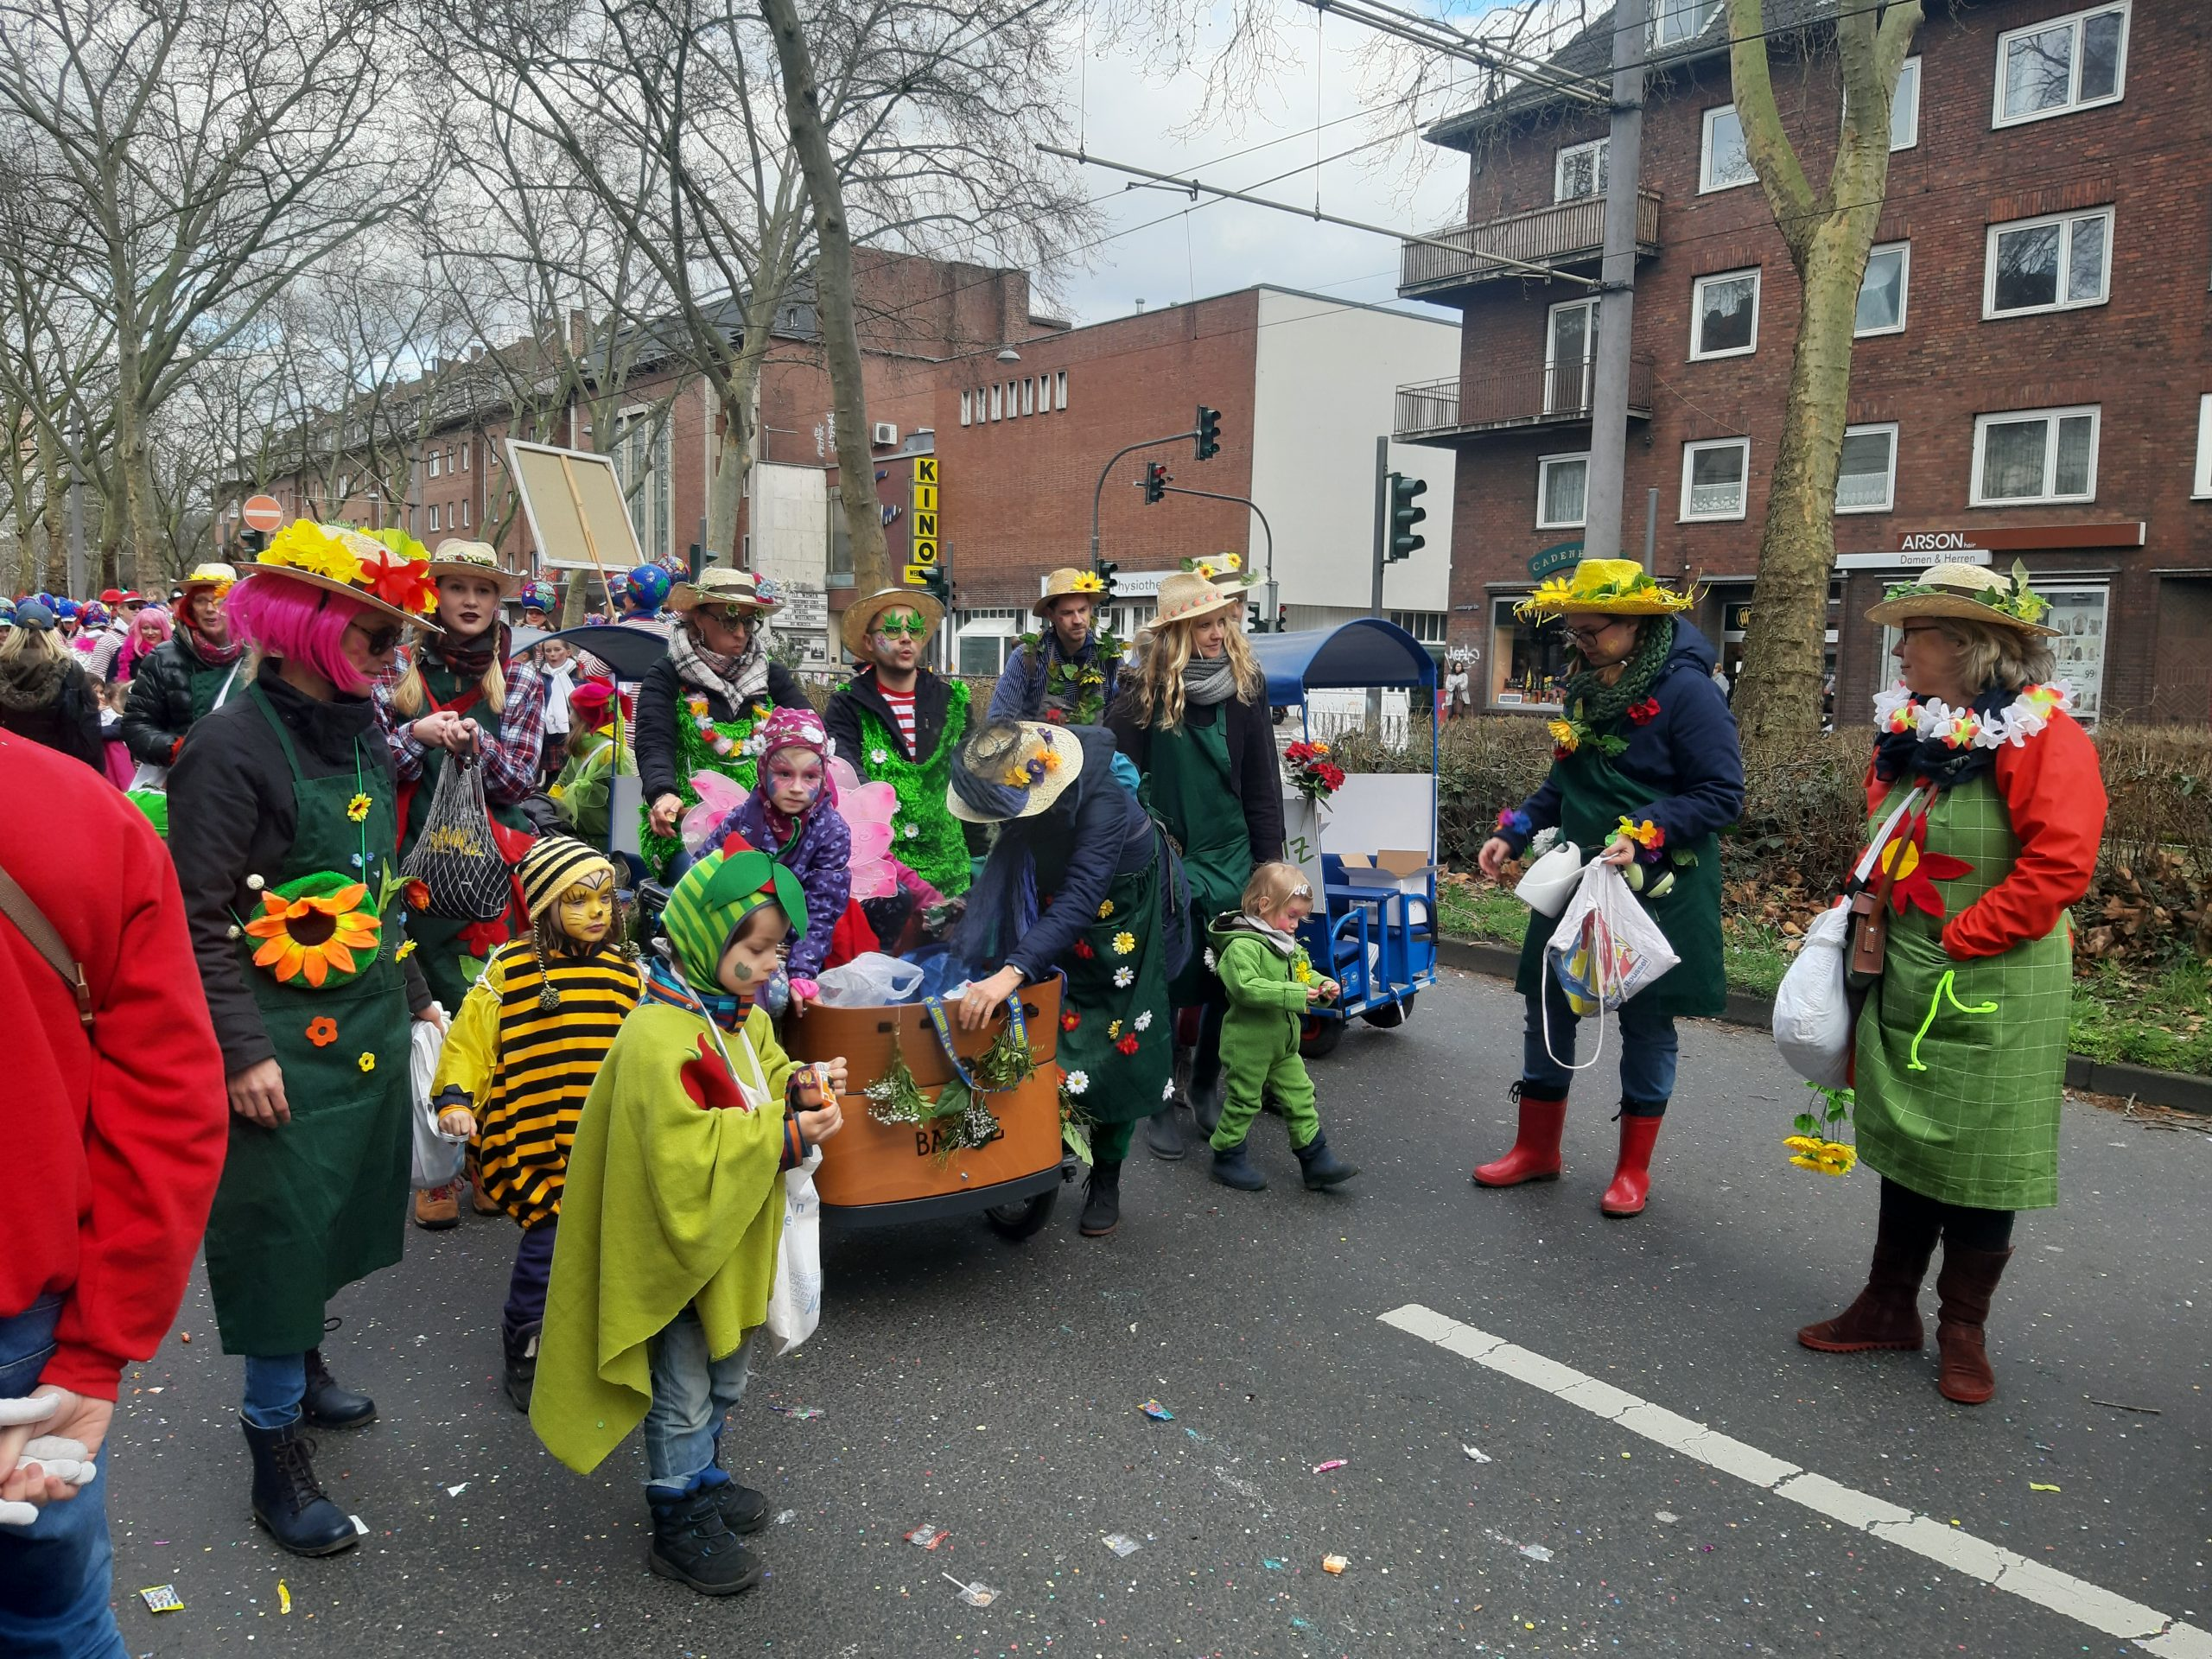 Karneval in Köln: Kinder werfen beim Veedelszug in Sülz Kamelle. Foto: SR